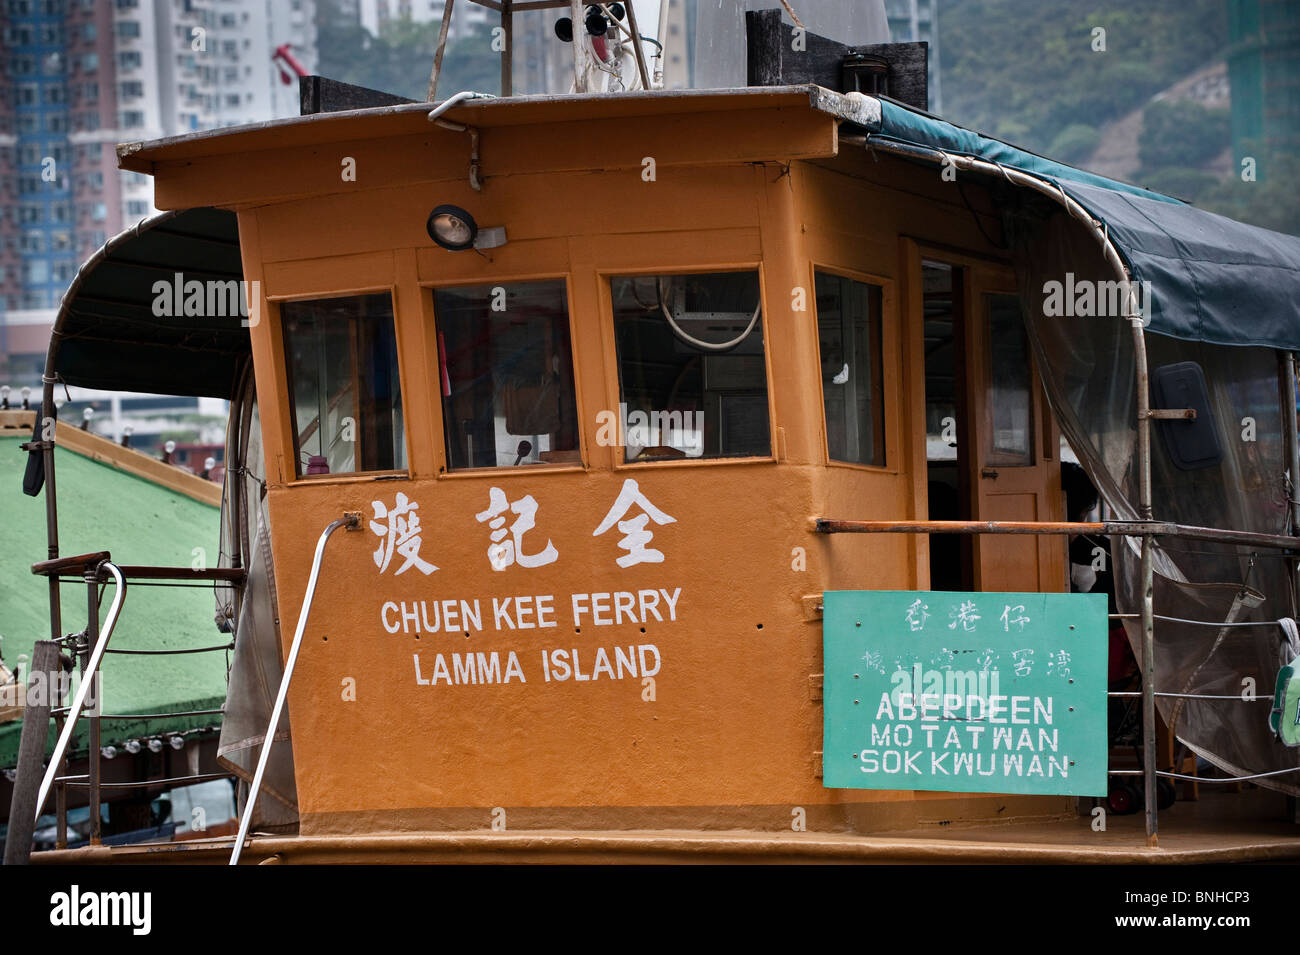 Ferry boat from Aberdeen on Hong Kong Island to Mo Tat Wan and Sok Kwu Wan on Lamma island. - Stock Image